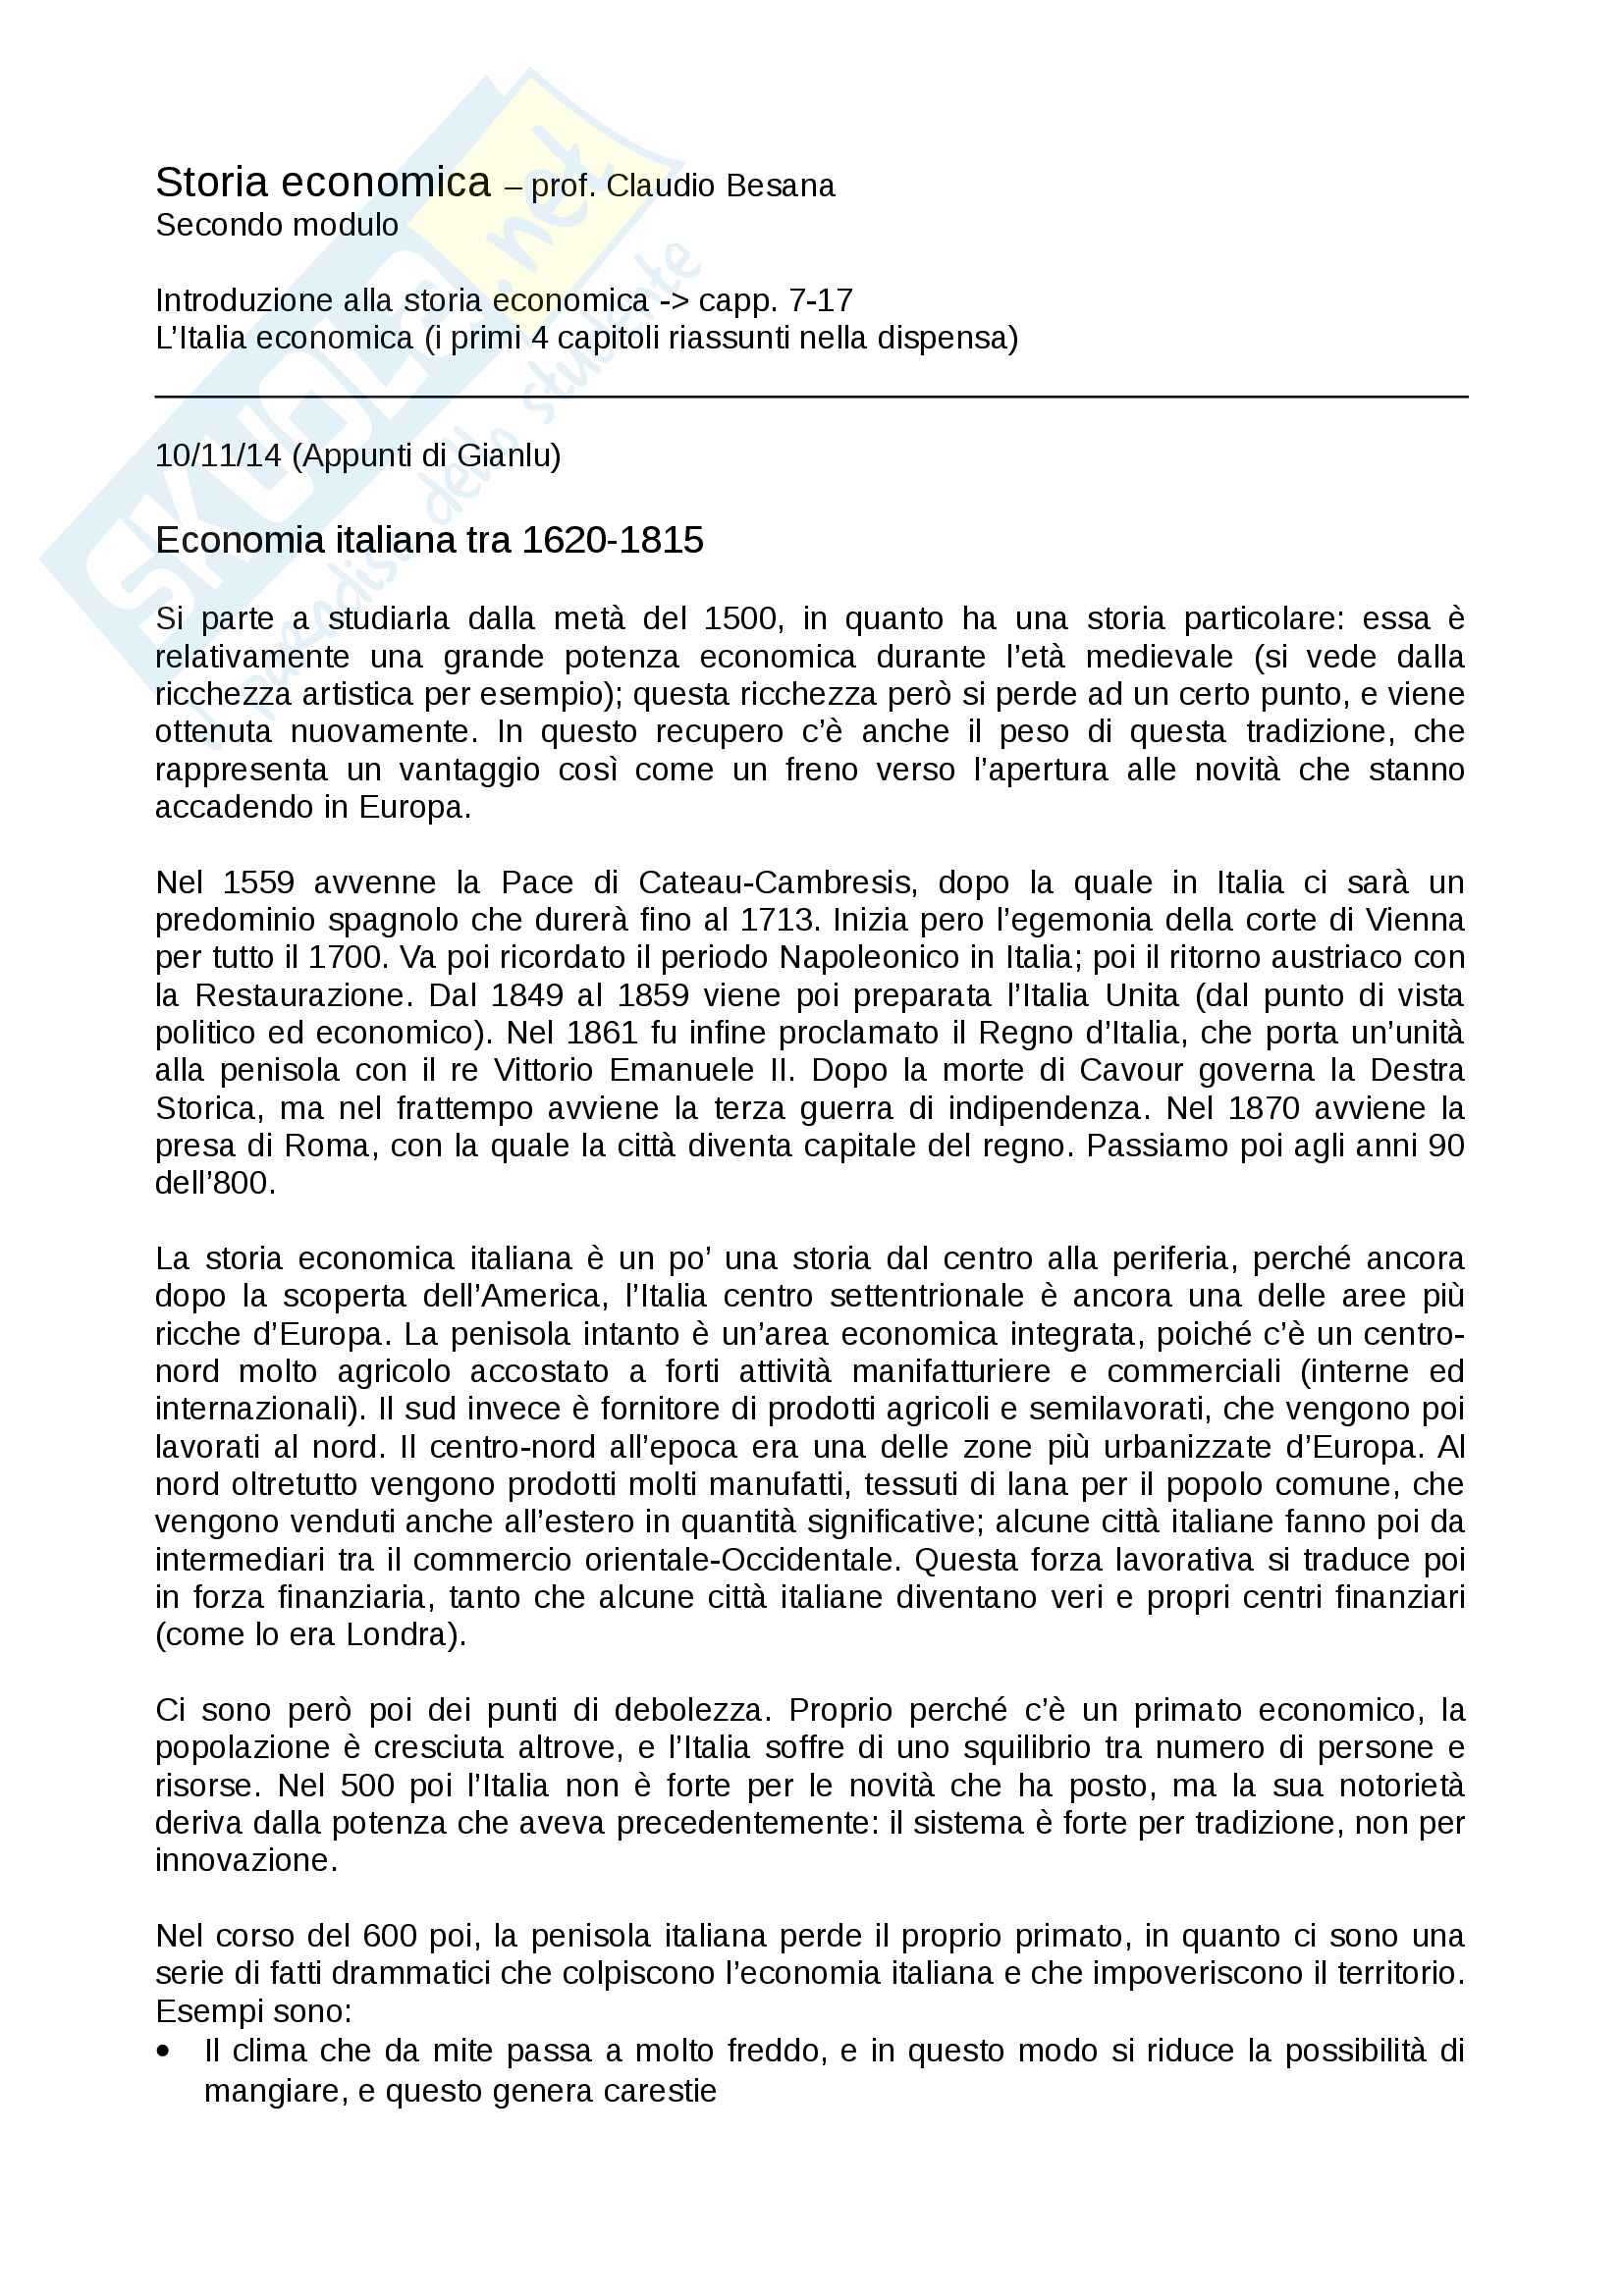 Appunti Storia economica Besana UNICATT